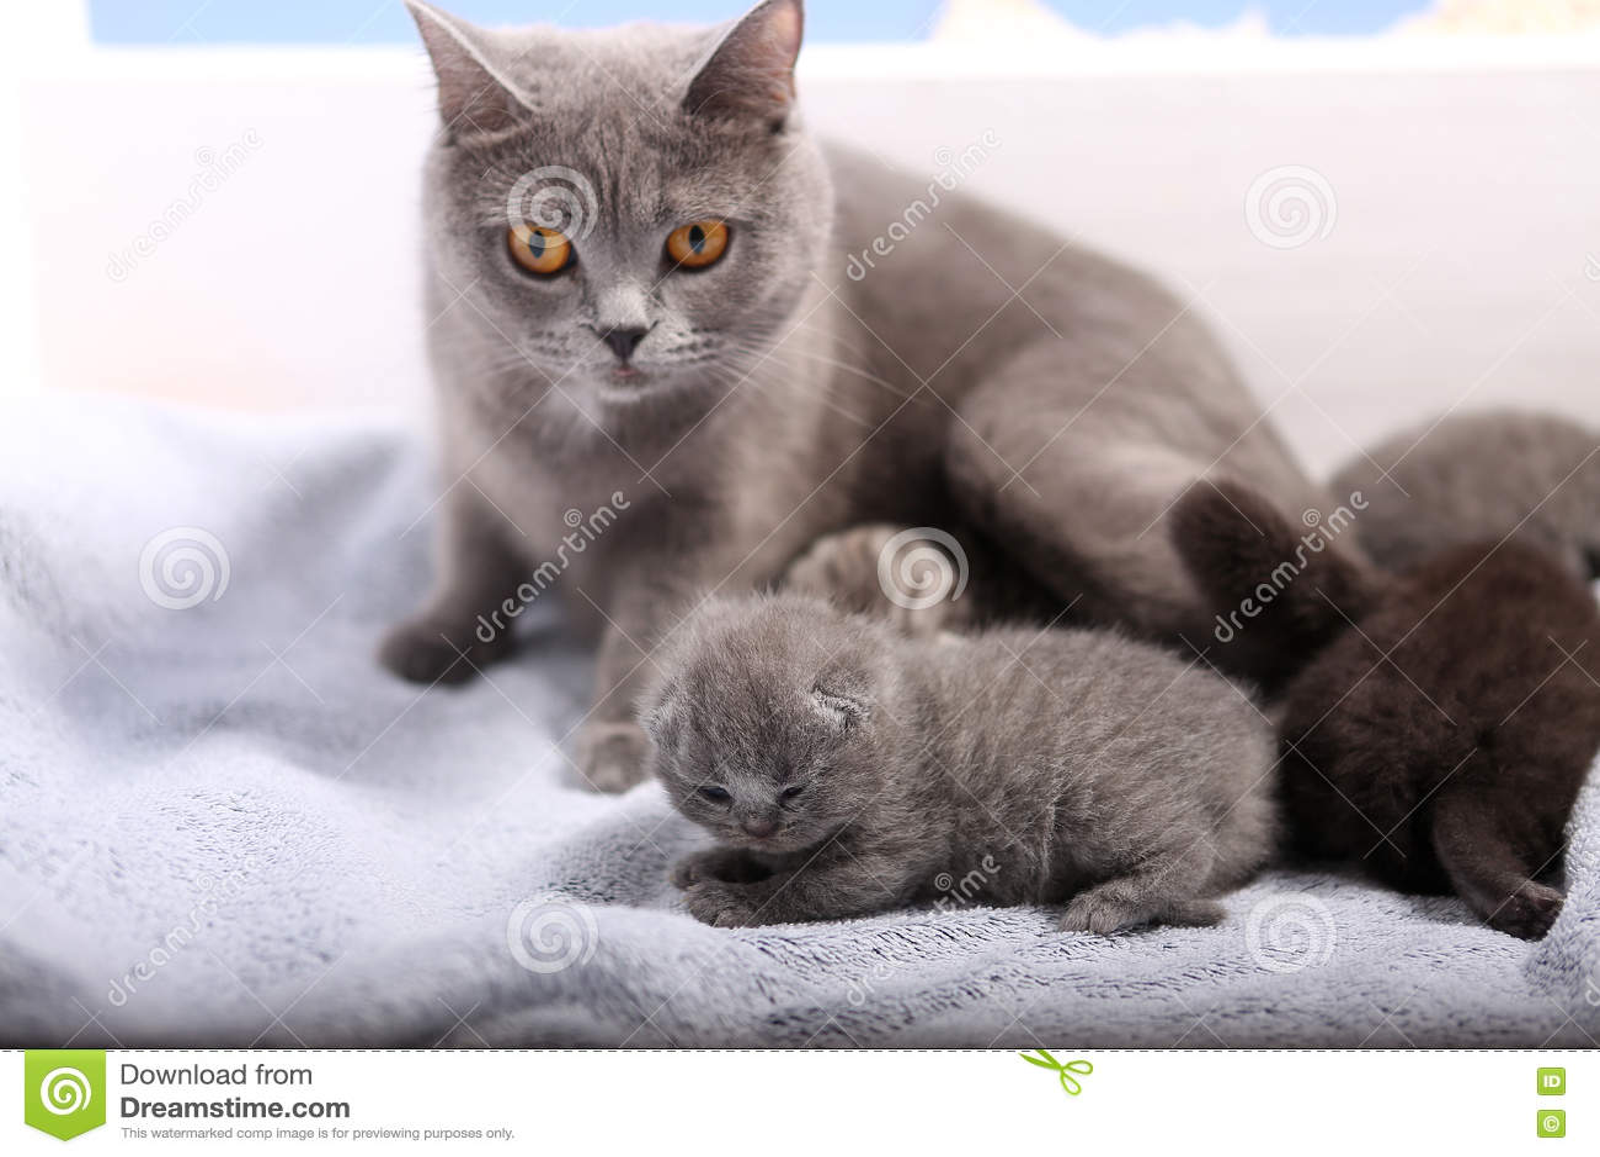 Newly born kittens